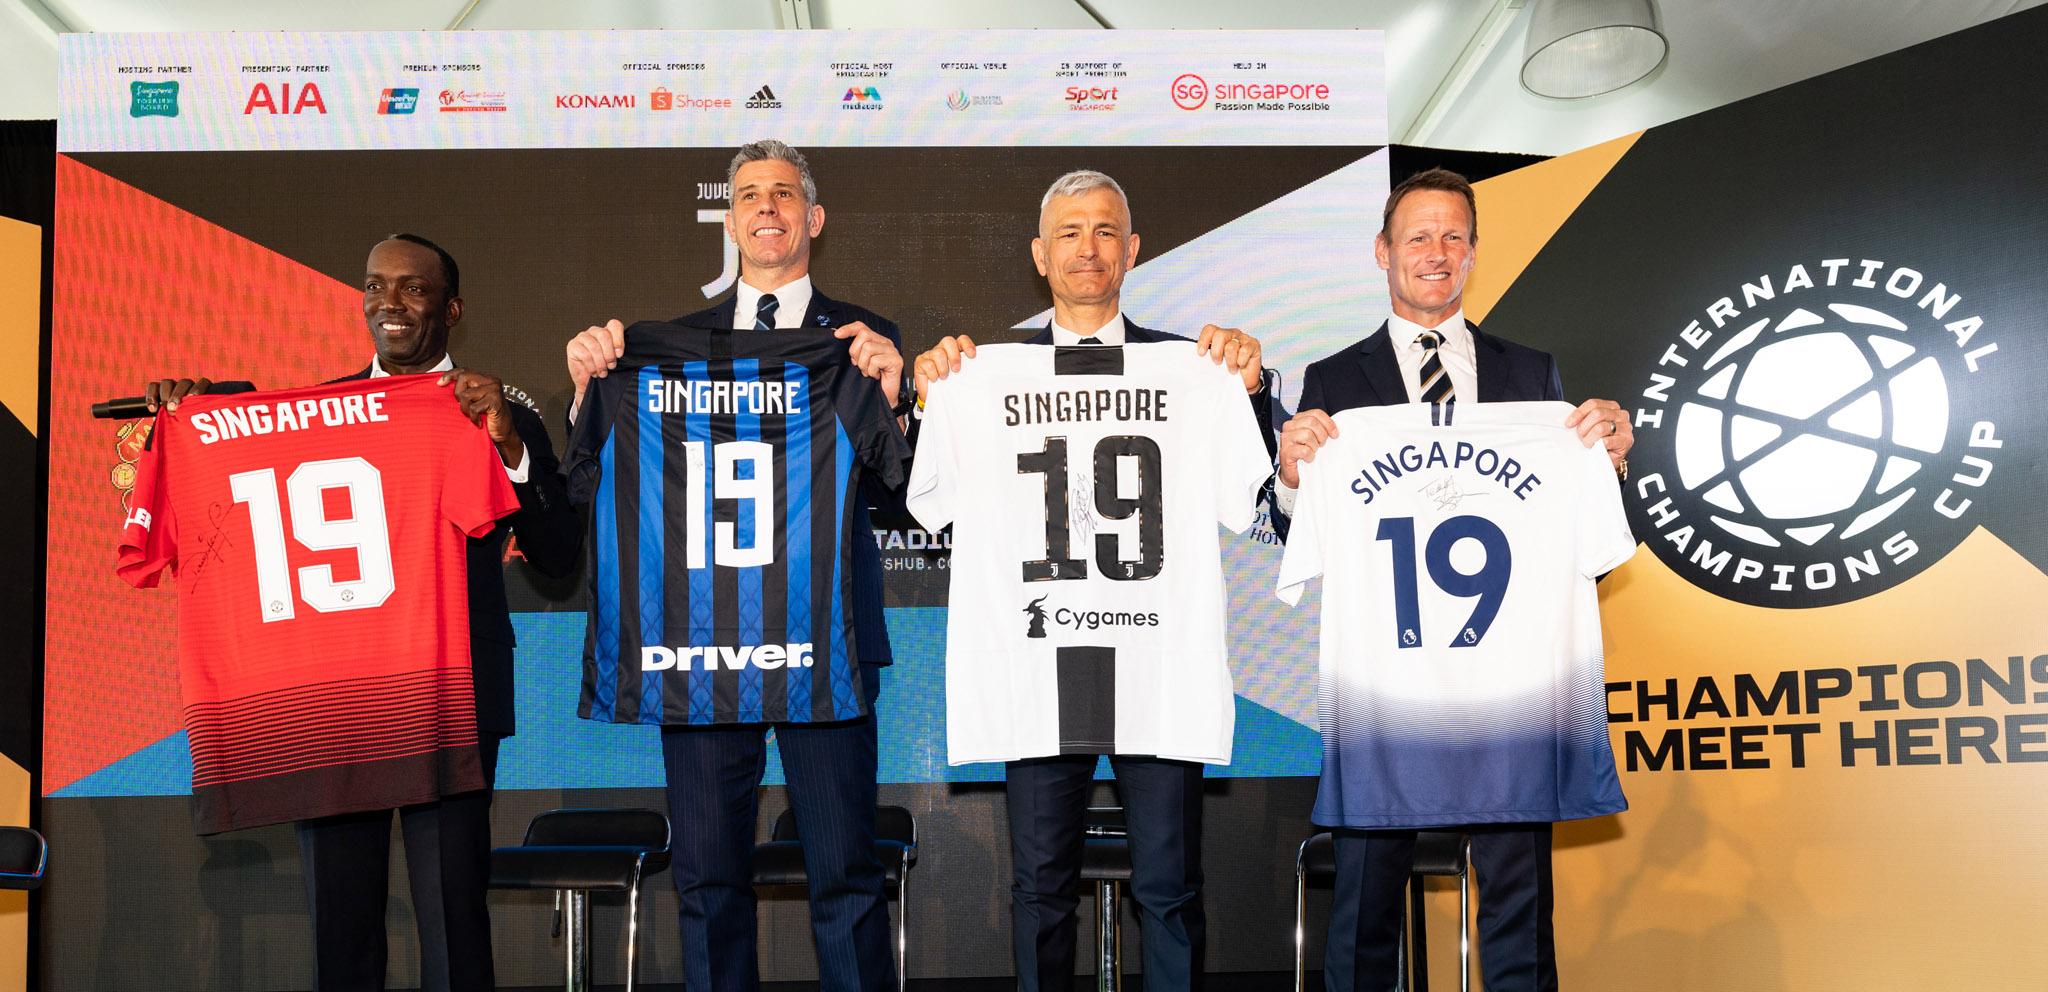 ICC 2019 tổ chức tại Singapore